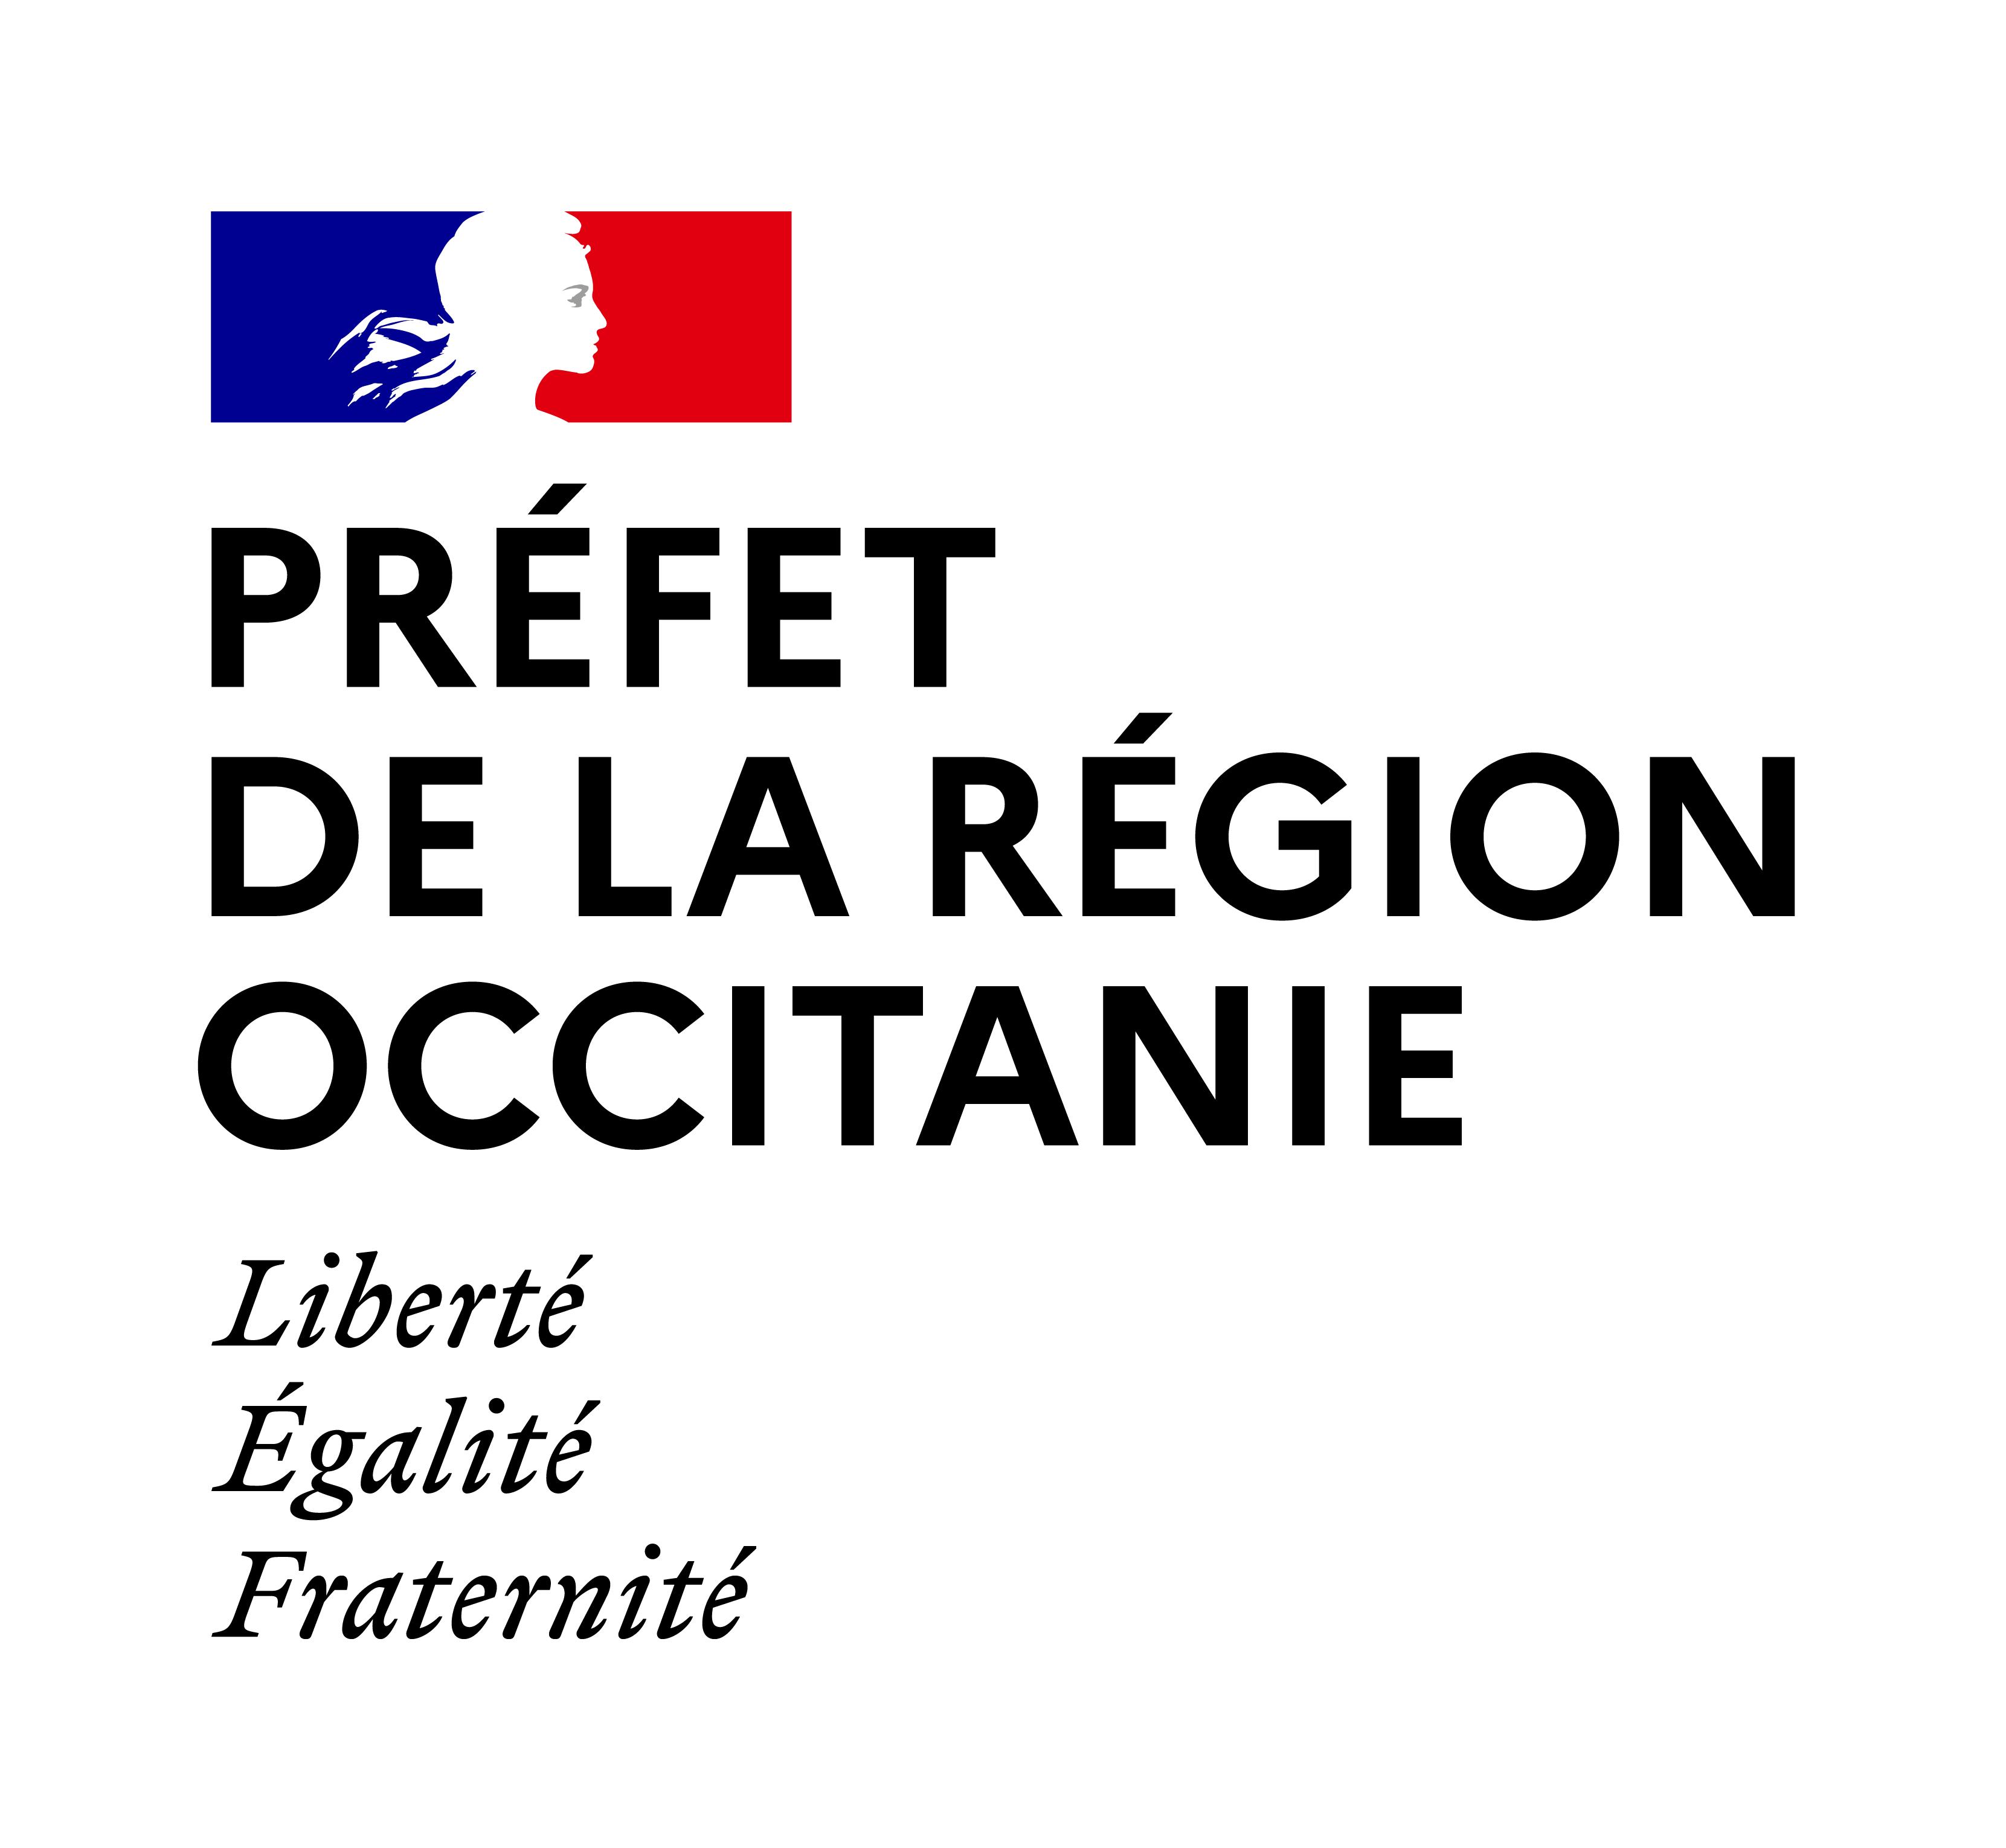 PREF_region_Occitanie_RVB